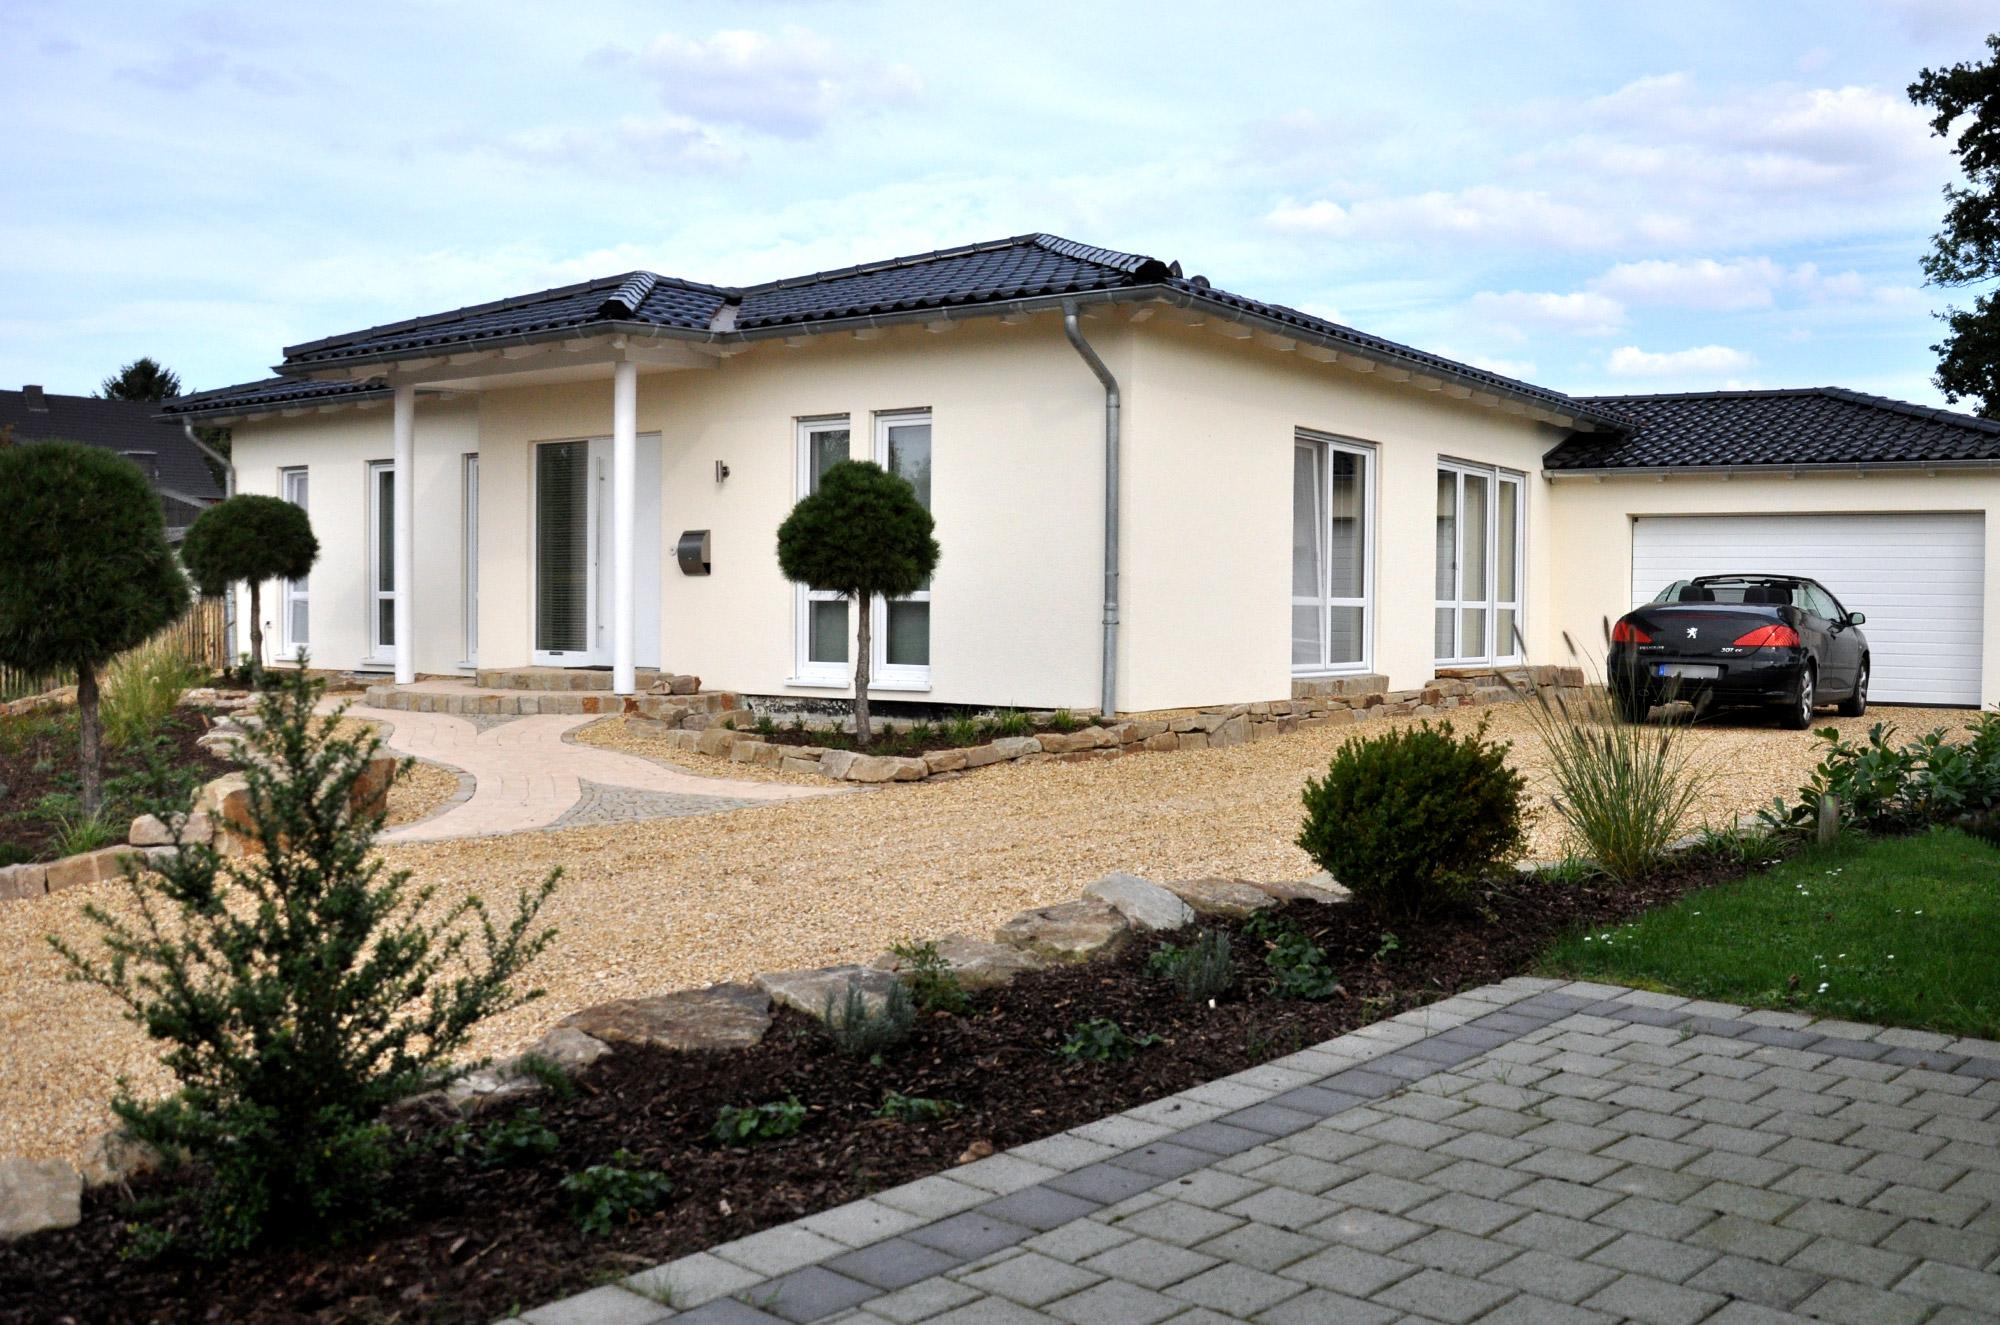 Hausbau-Bungalow Münster